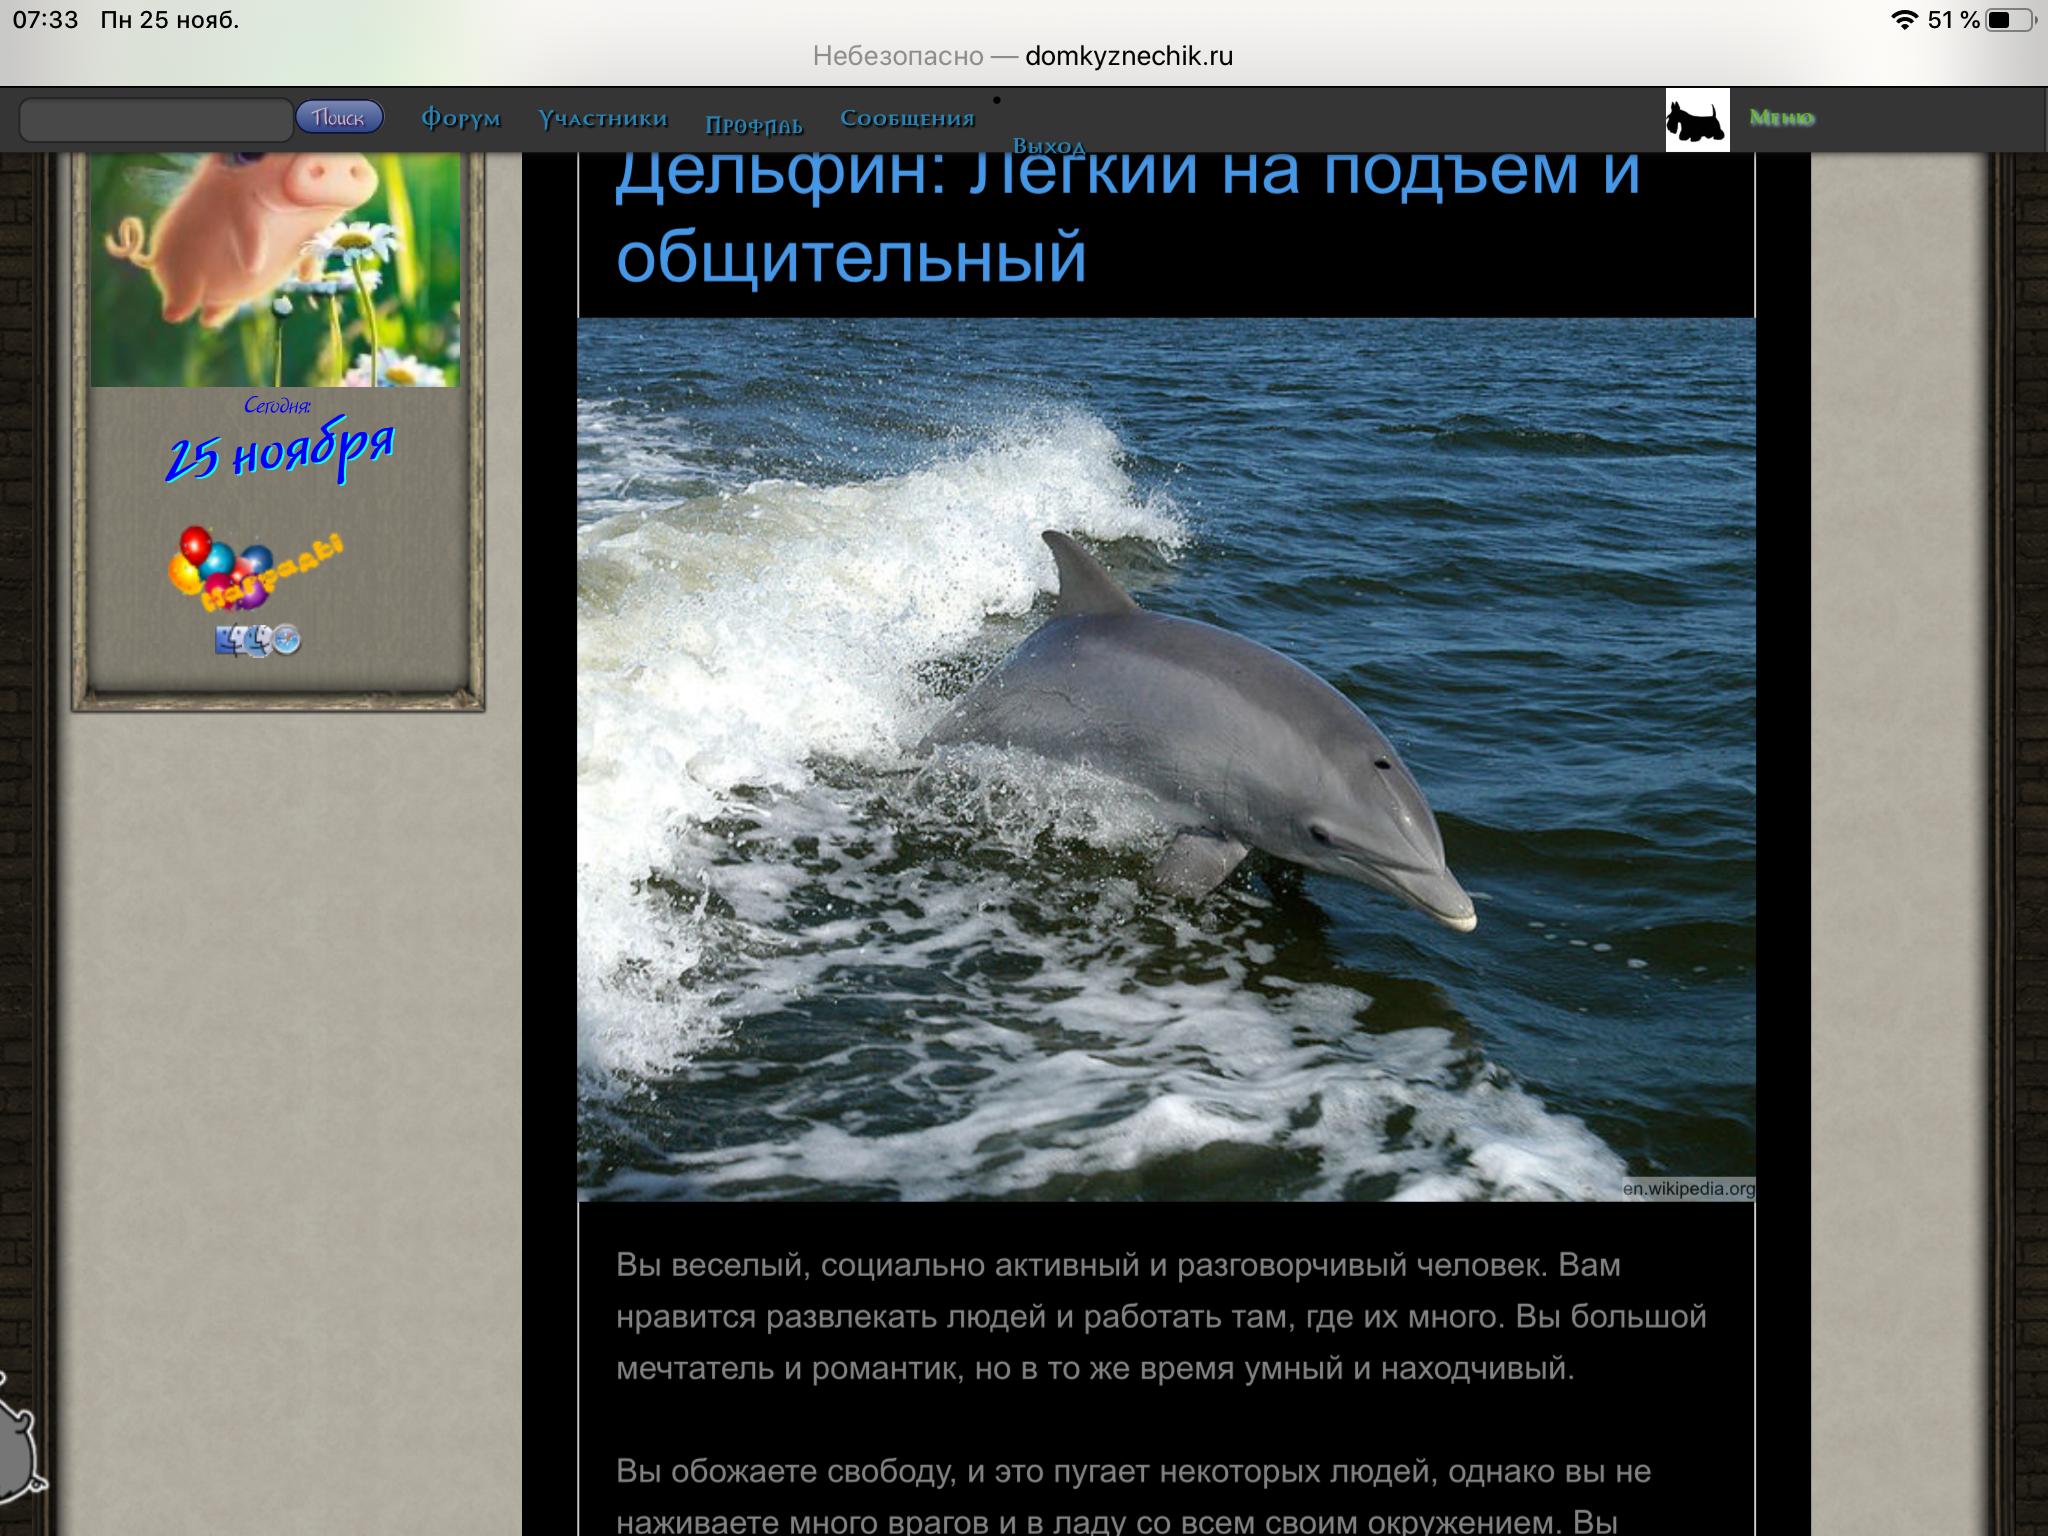 https://i4.imageban.ru/out/2019/11/25/9f01ebbd6281f6e0b1e03e343e653deb.png